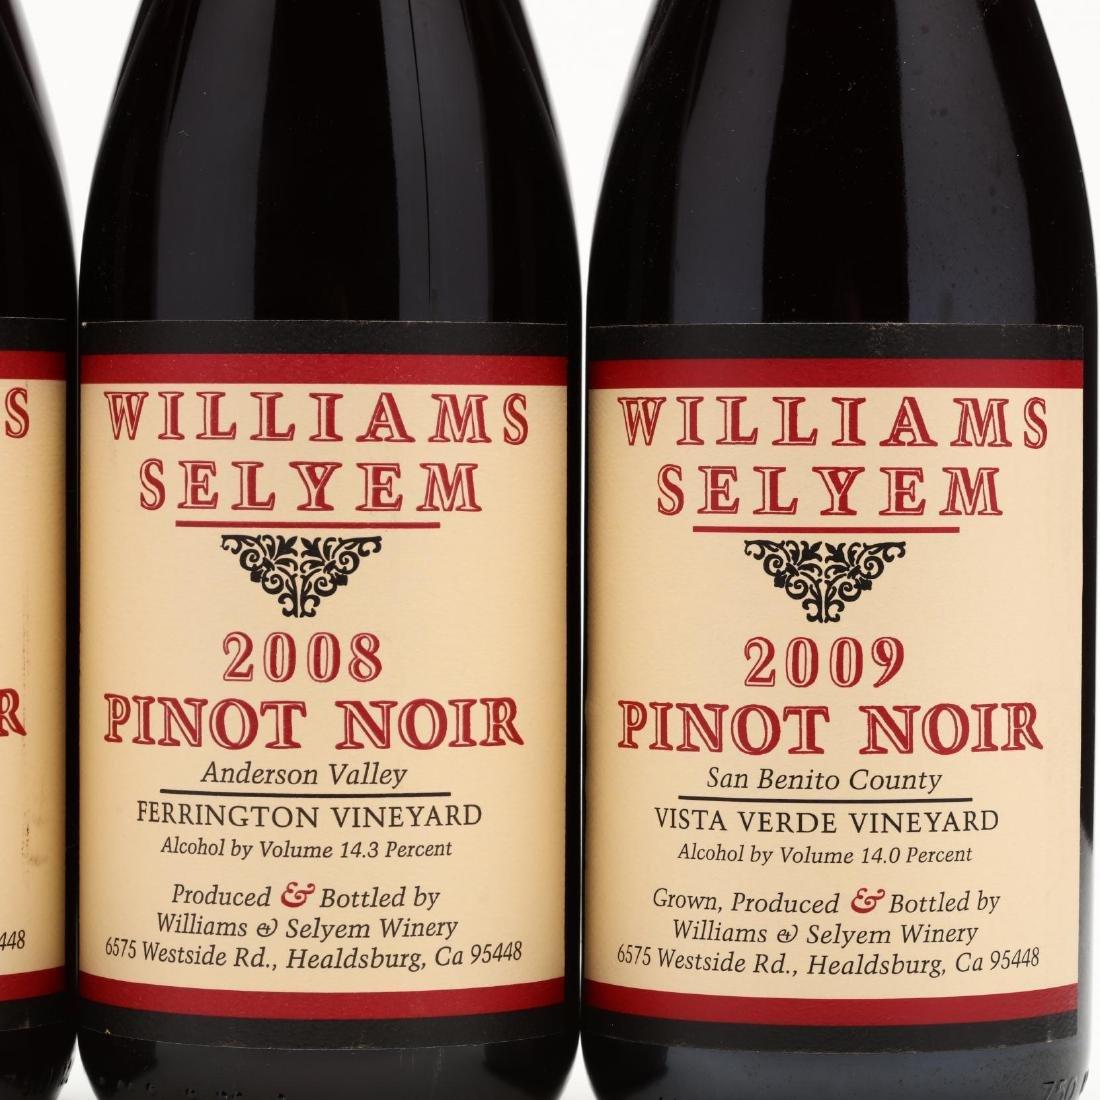 2008 & 2009 Williams Selyem - 2